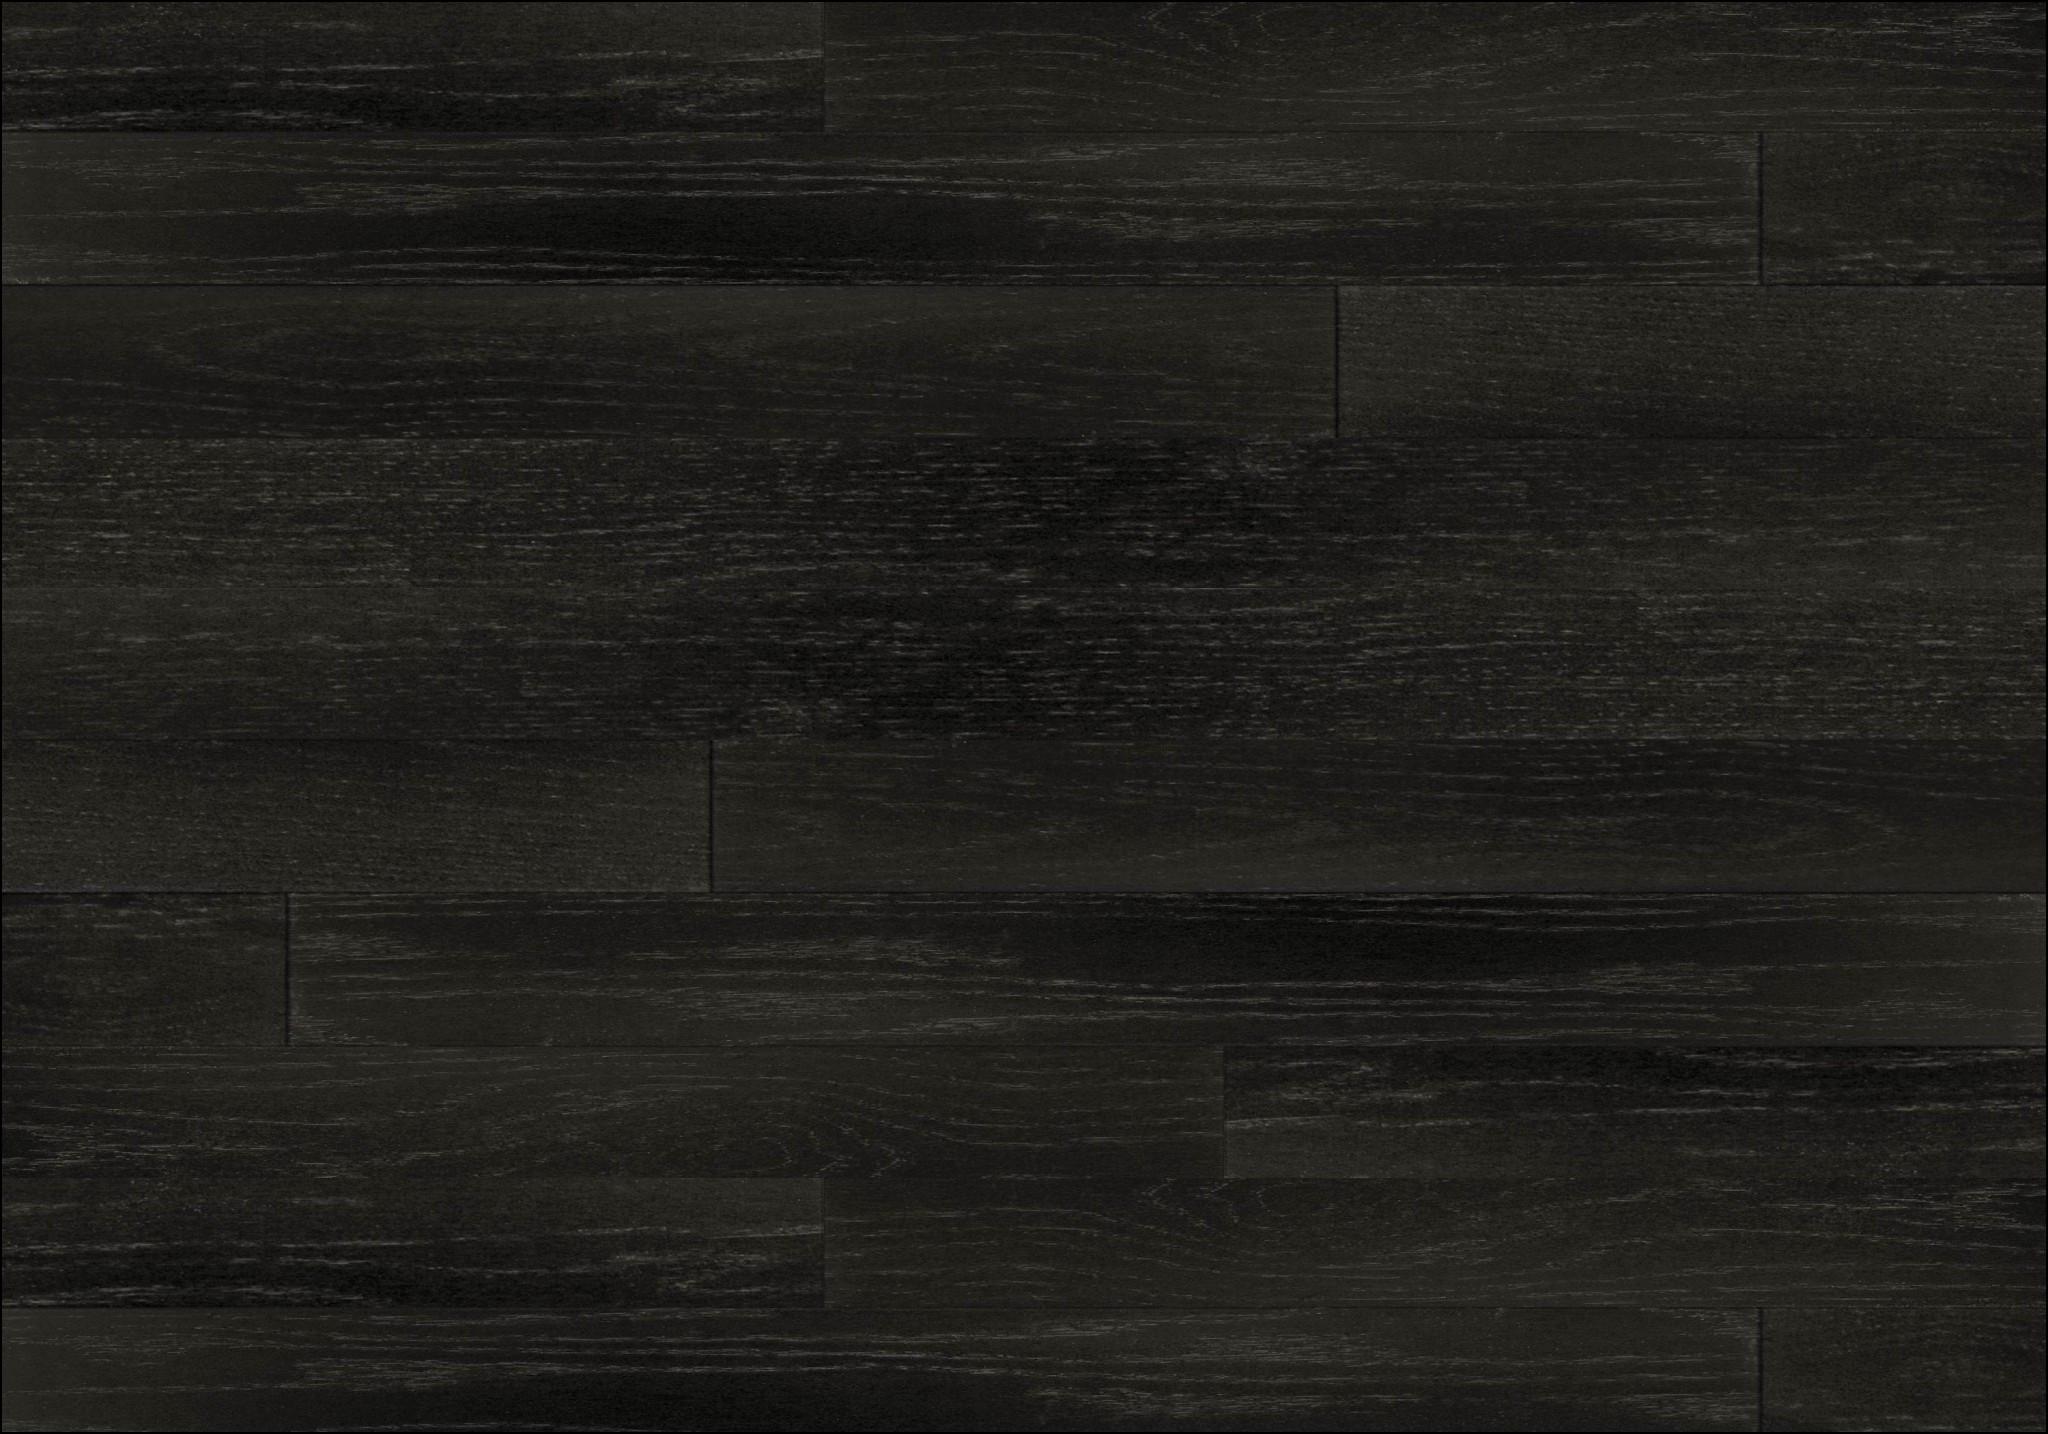 hl hardwood floors of hardwood flooring suppliers france flooring ideas inside hardwood flooring cost for 1000 square feet stock articles rippnfinish hardwood floor refinishing of hardwood